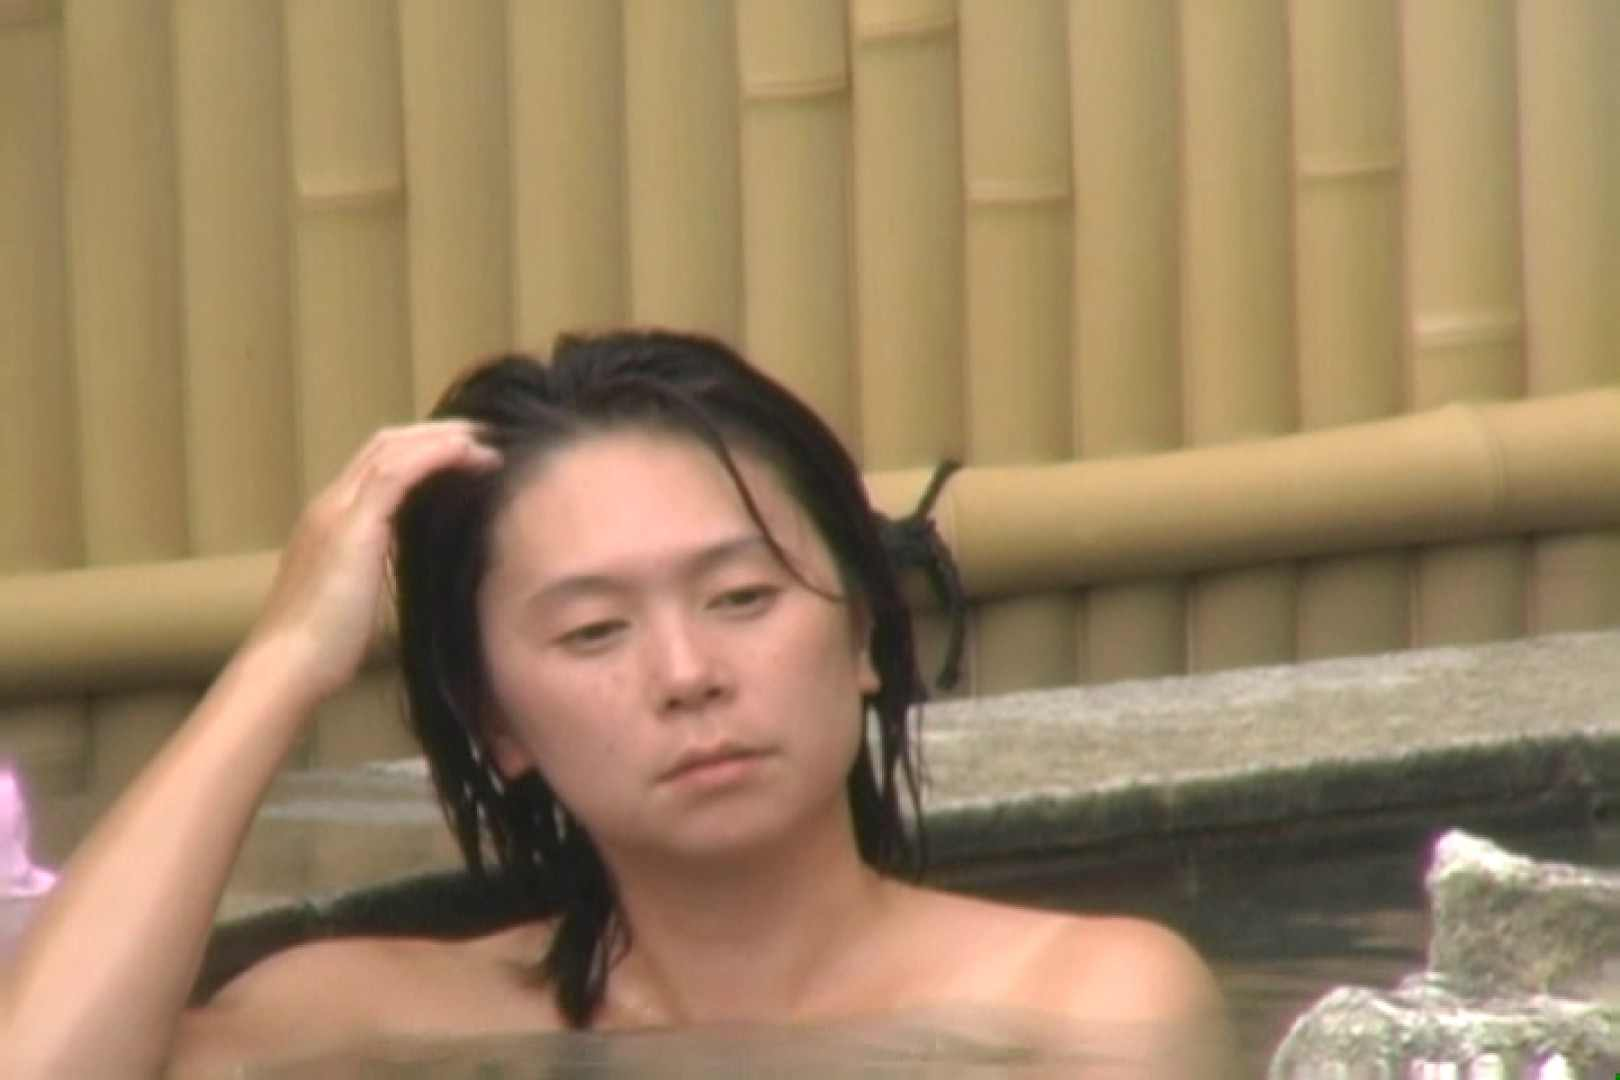 Aquaな露天風呂Vol.619 盗撮シリーズ | 露天風呂編  75PIX 25